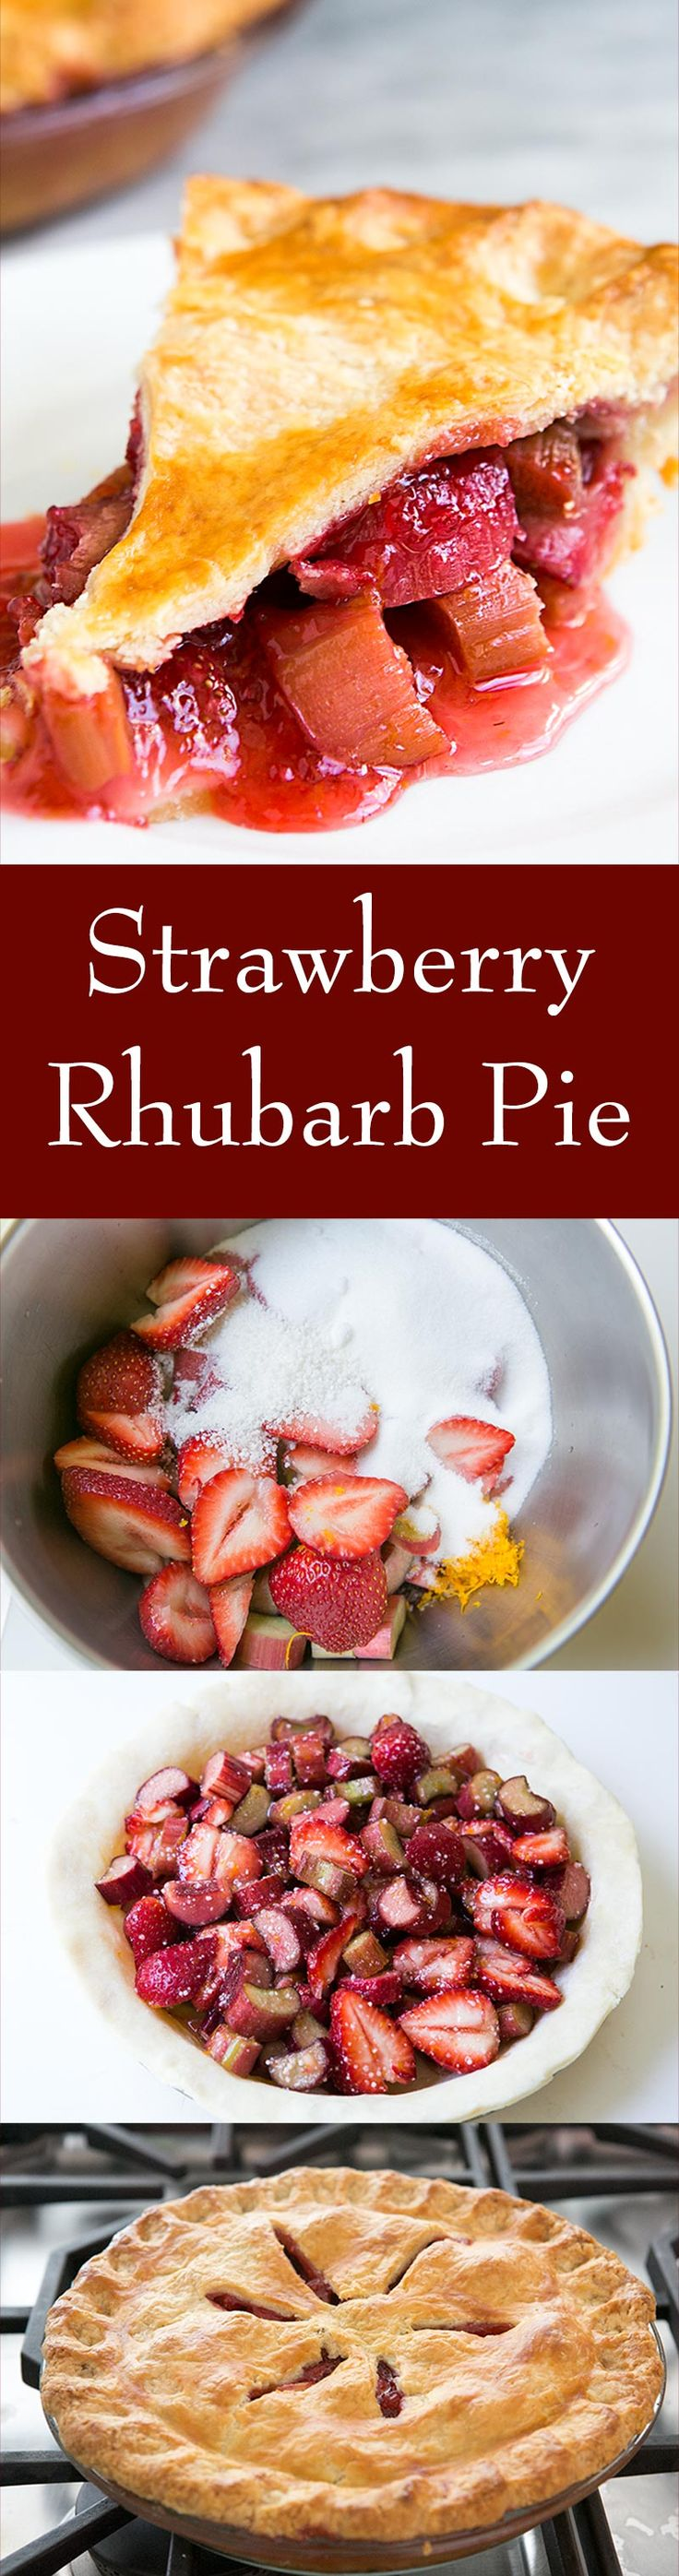 ... Strawberry Pie on Pinterest | Pies, Strawberries and Strawberry Pie